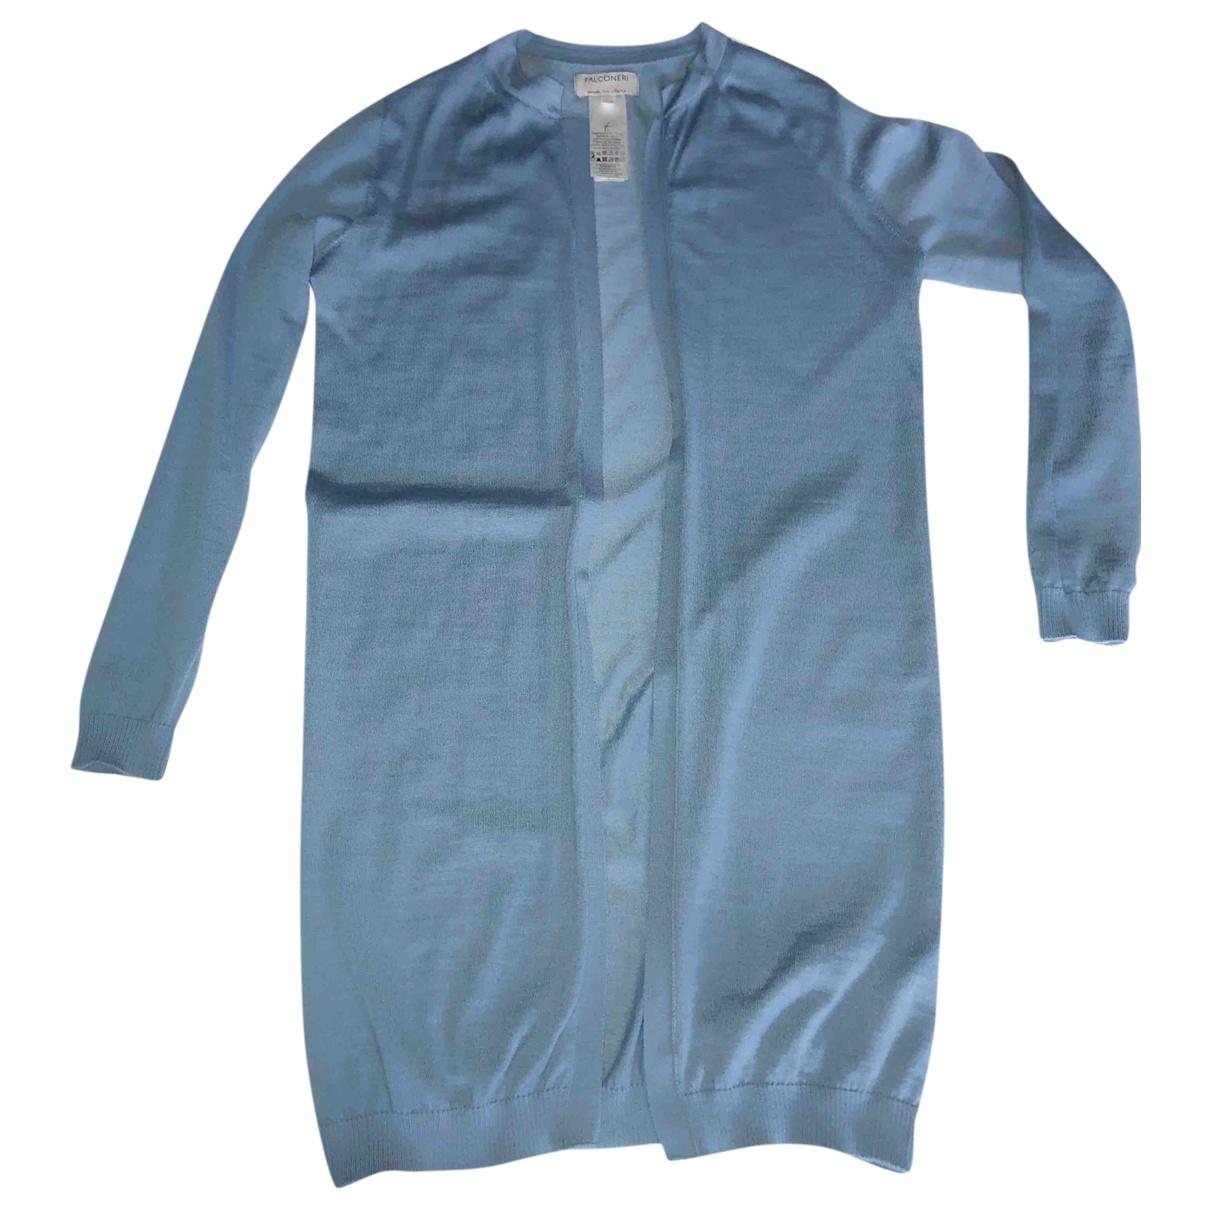 Falconeri \N Blue Cashmere Knitwear for Women M International